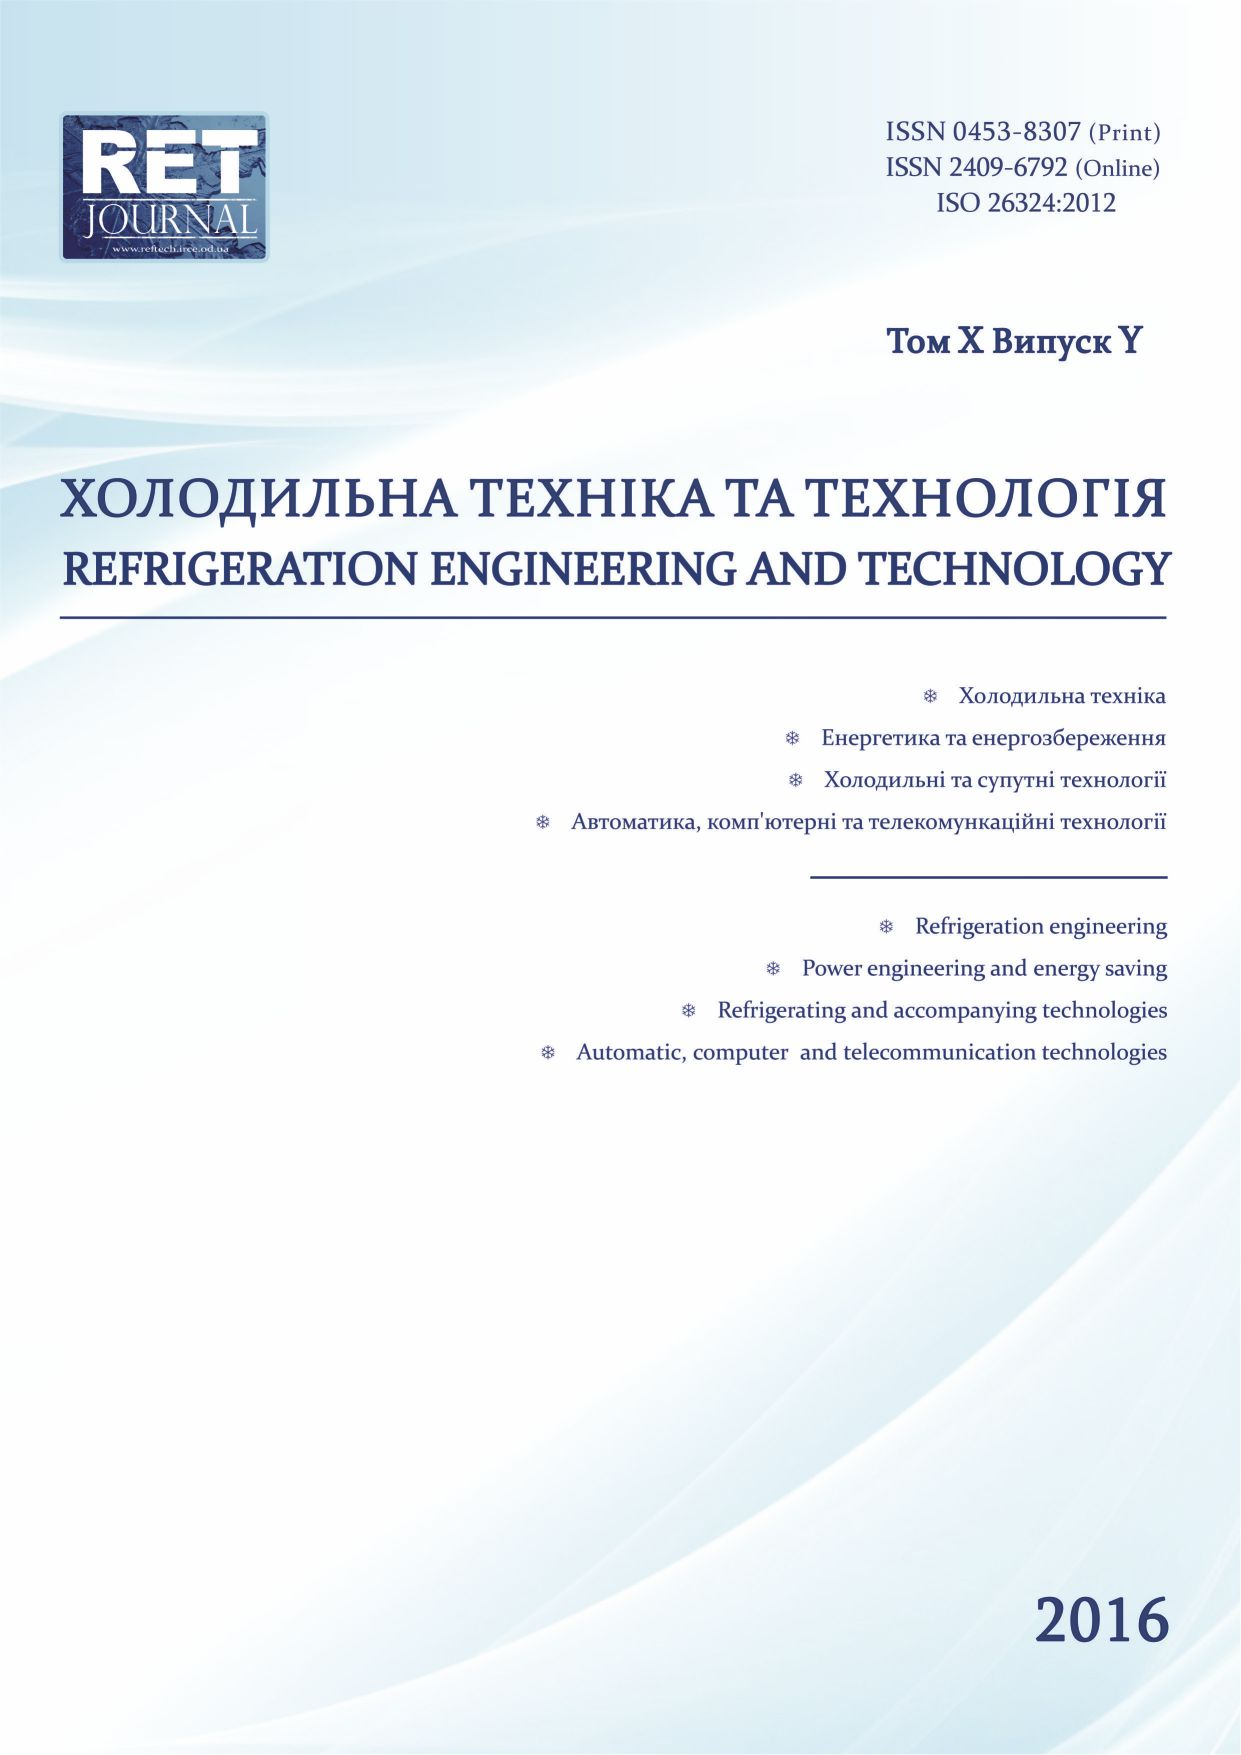 COMPUTER PROGRAM FOR CALCULATION MICROCHANNEL HEAT